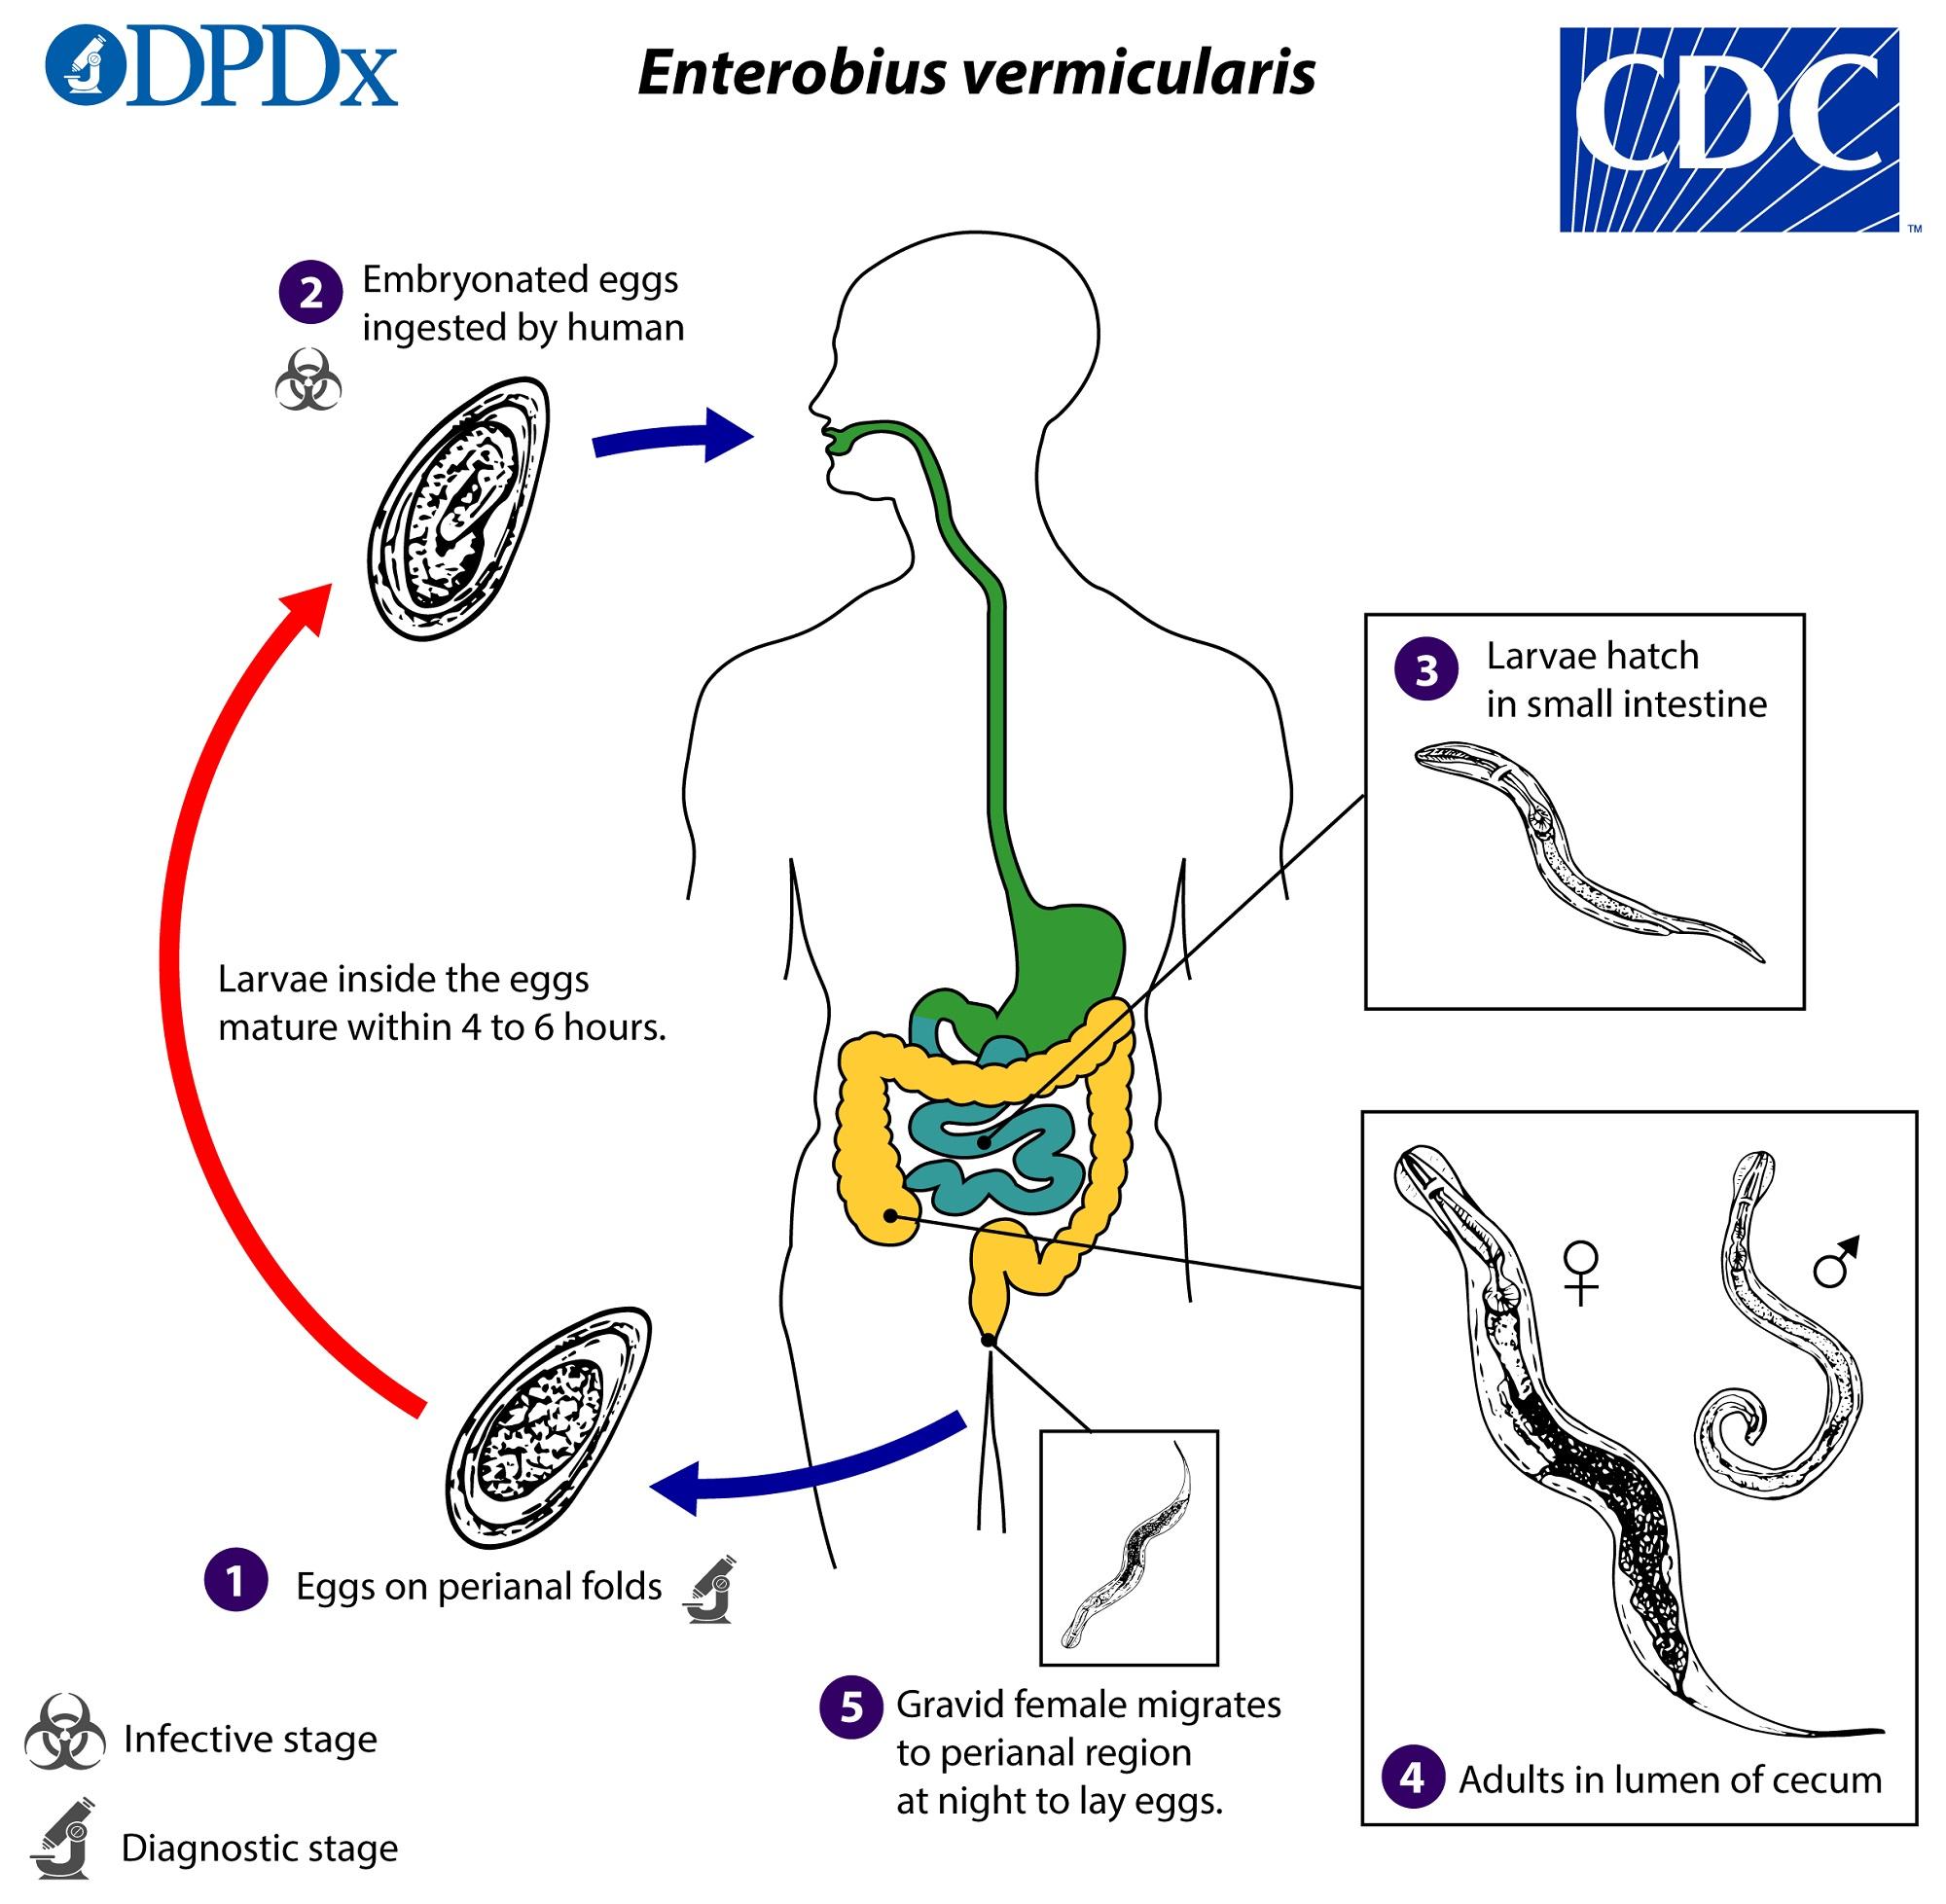 Enterobius vermicularis estadios, Atlas-de-Parasitologia kd-group.ro - PDF Free Download